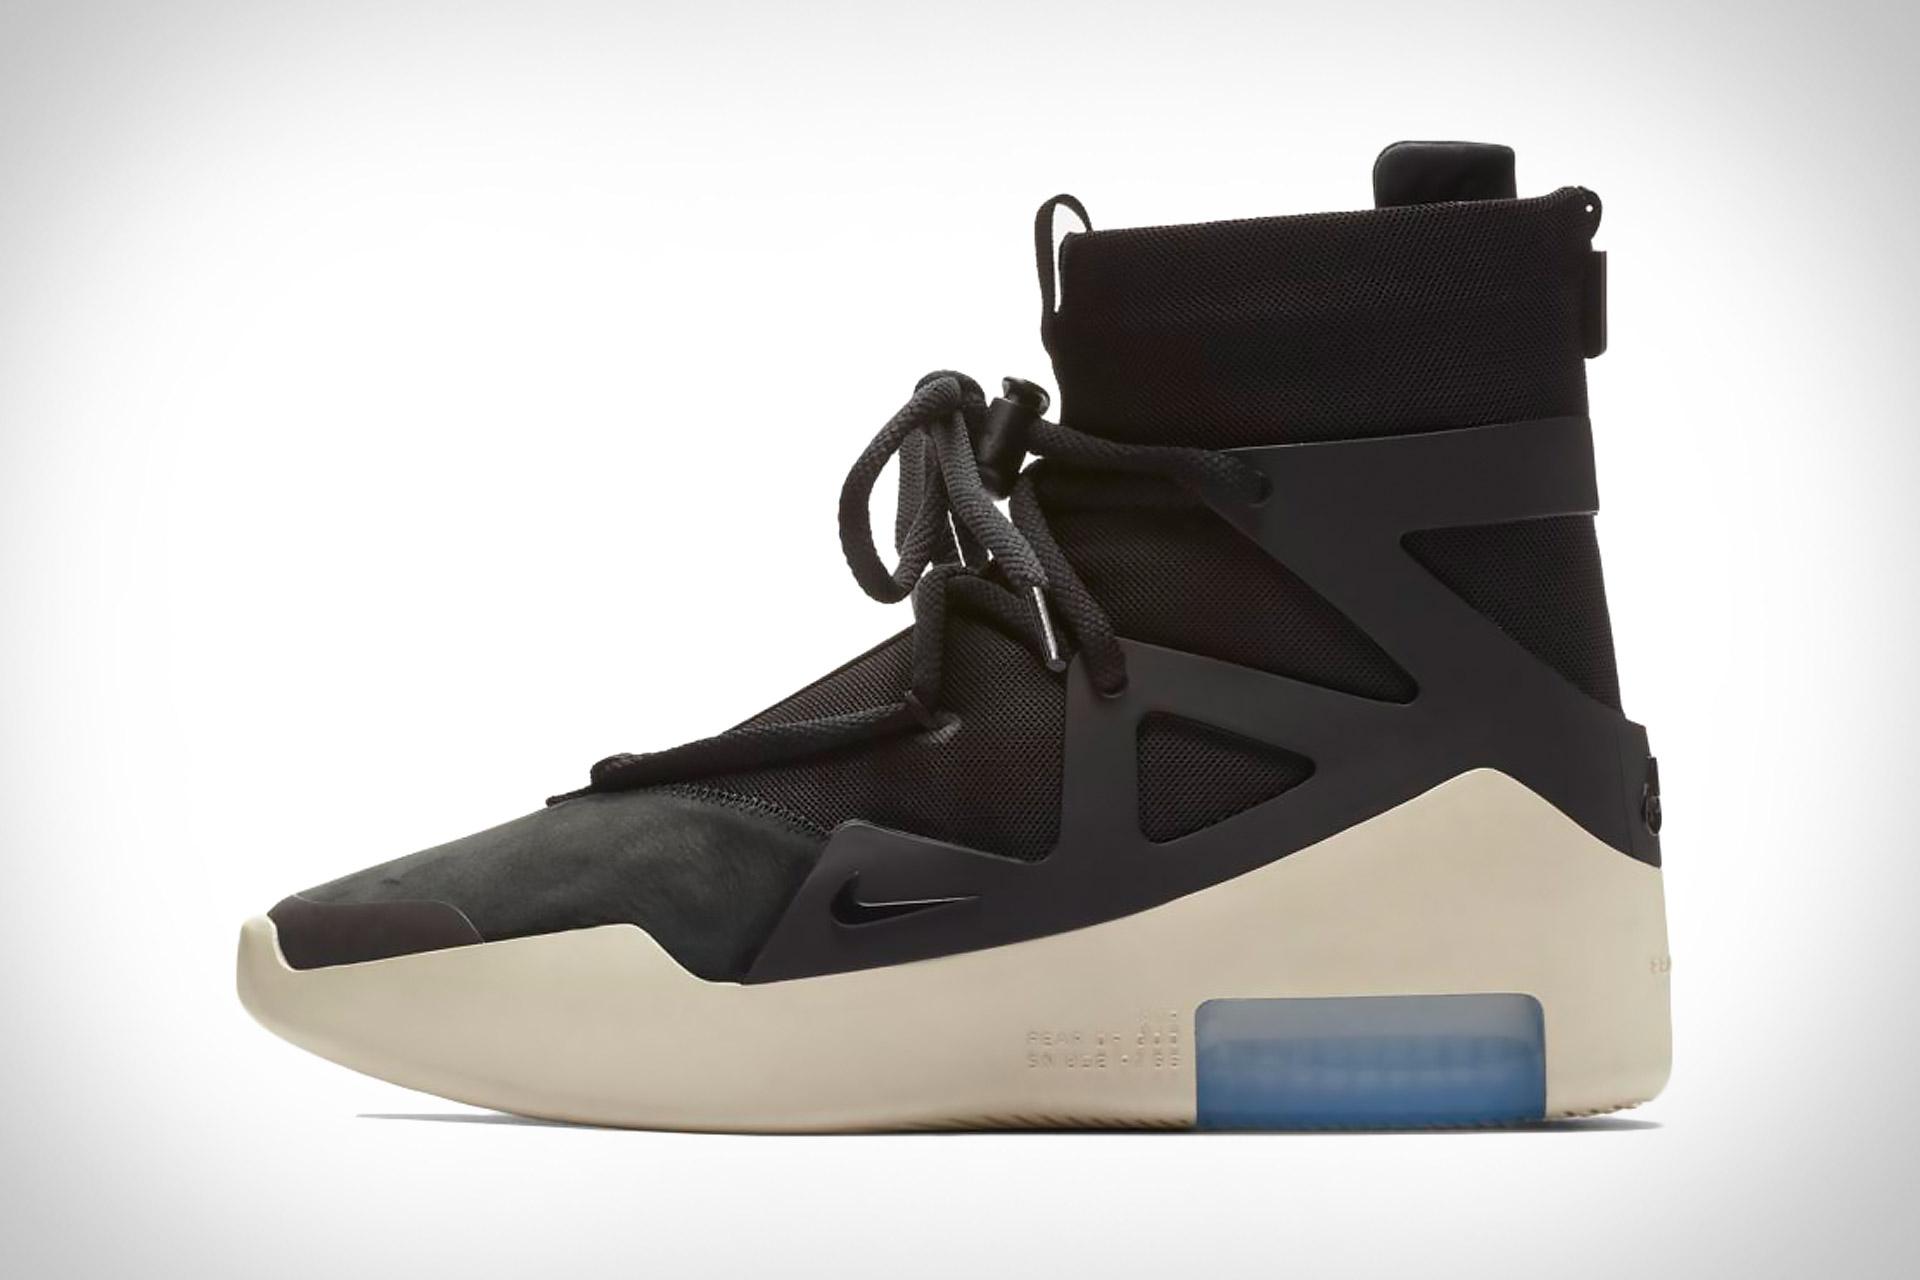 Nike Air Fear of God 1 Sneaker | Uncrate